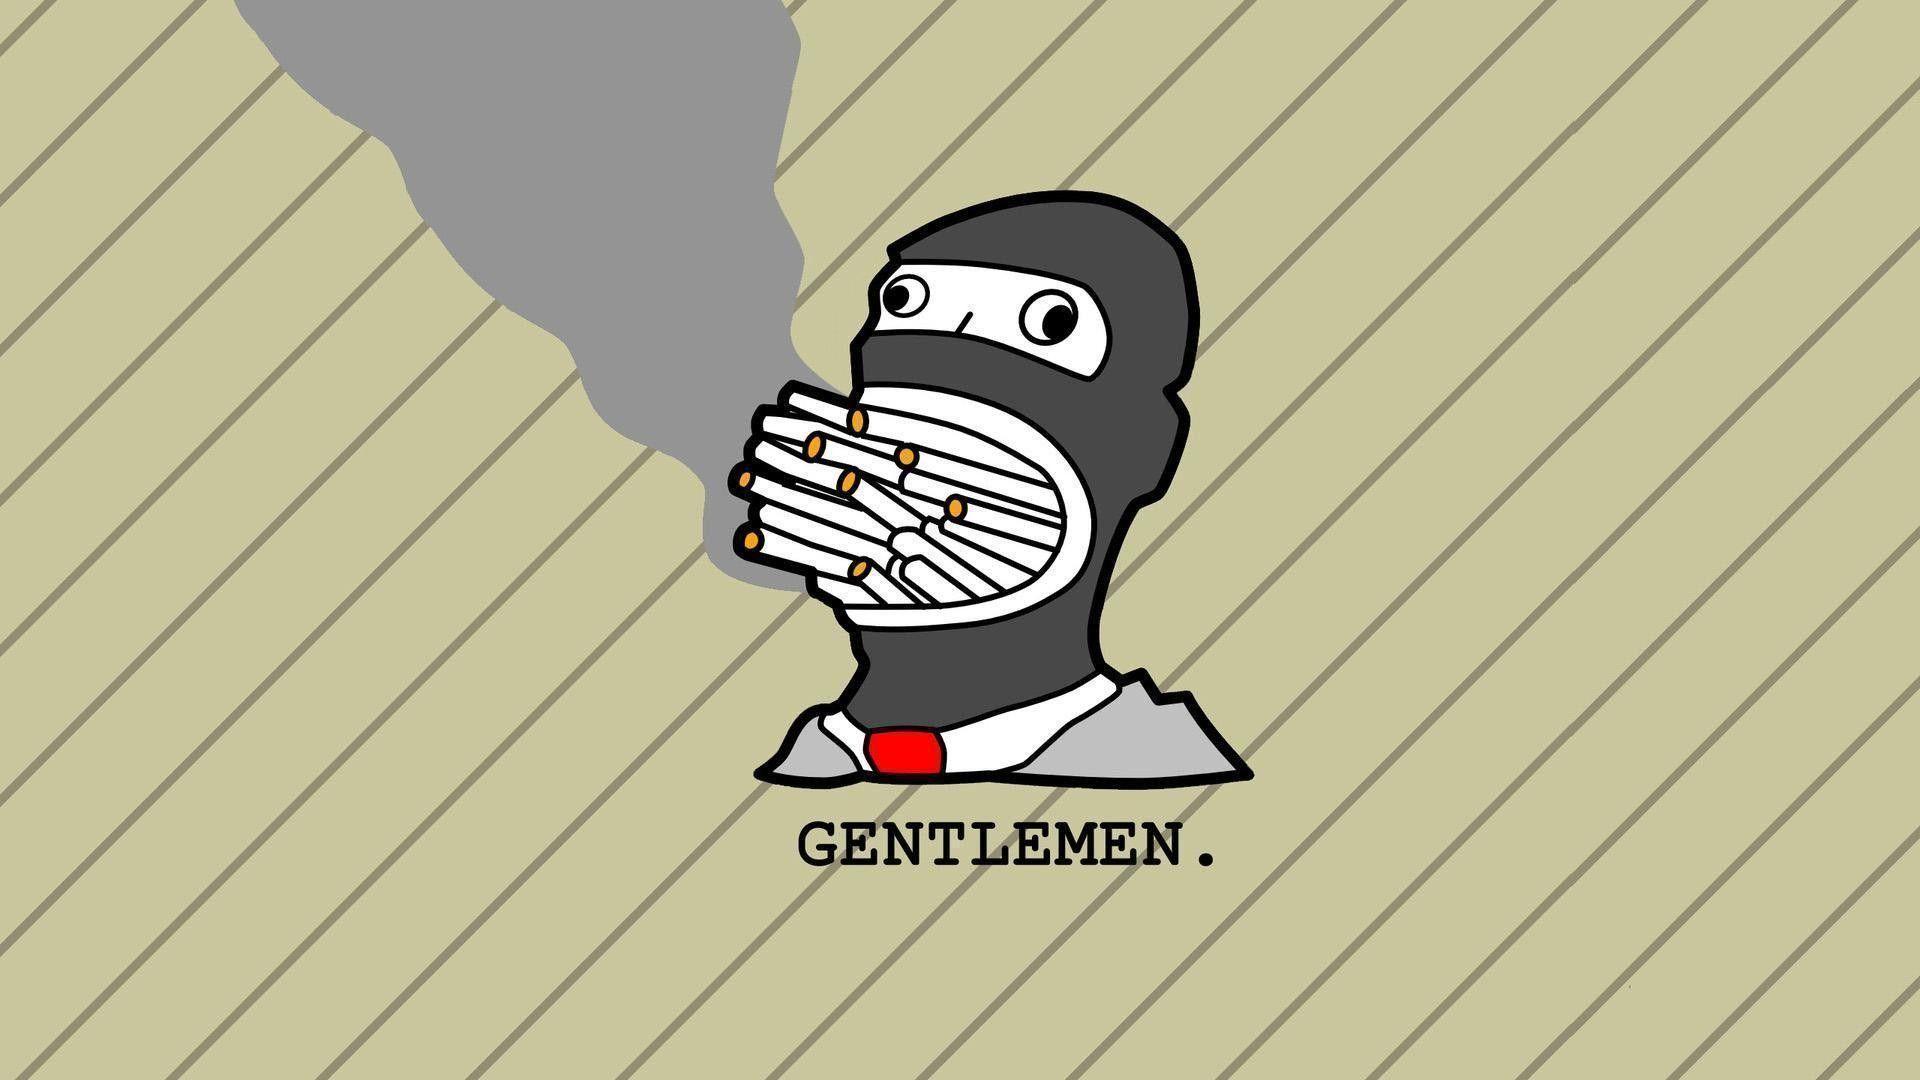 Meme Wallpapers Top Free Meme Backgrounds Wallpaperaccess